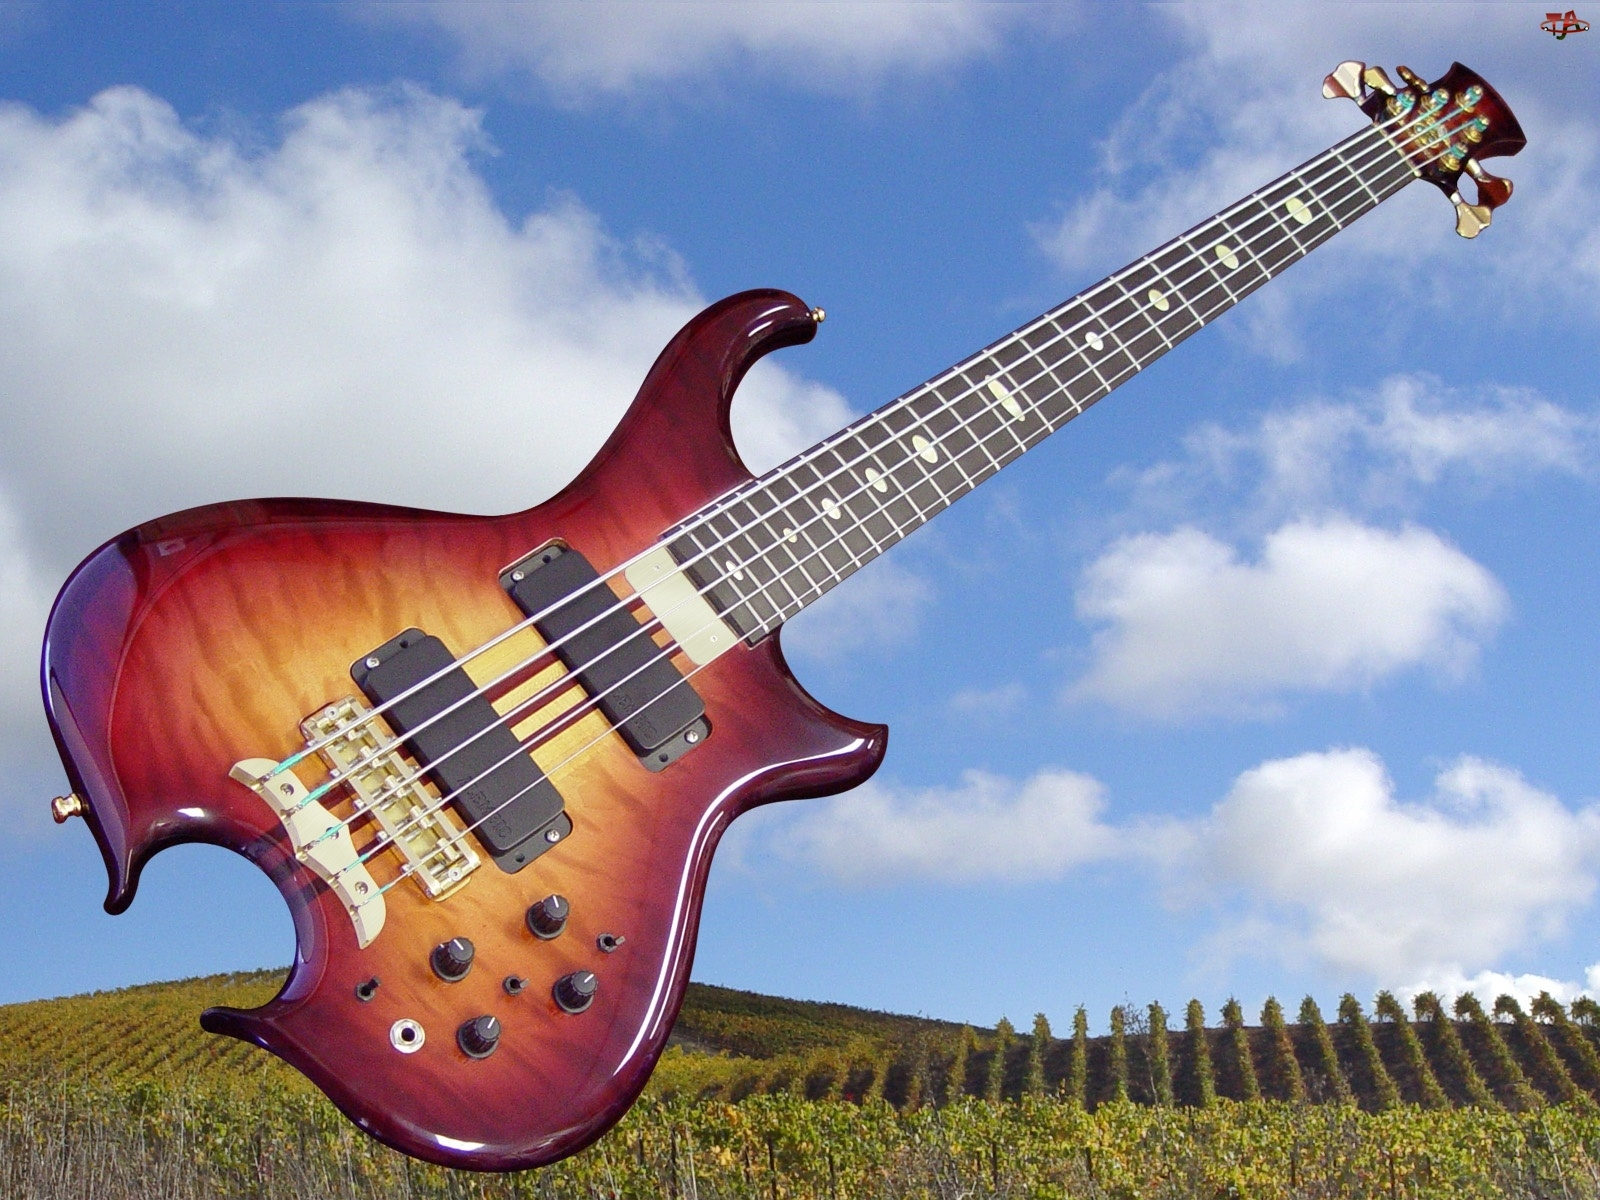 Gitara, Chmury, Pole, Niebo